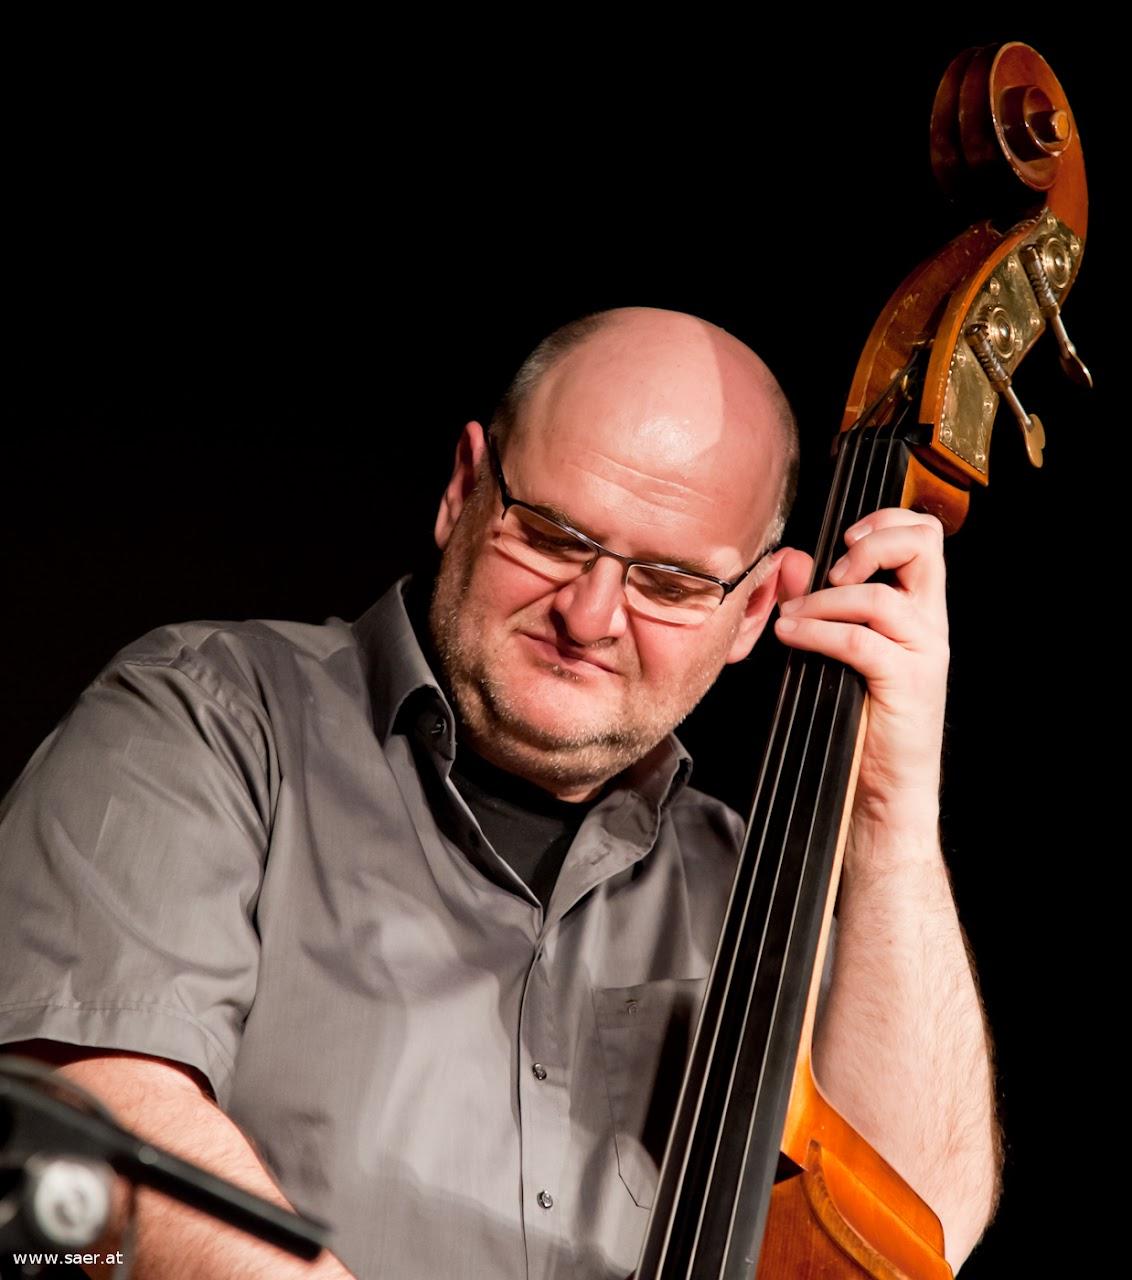 Frank Hoffmann & mg3 - SAER_20110319_DSC4201.jpg